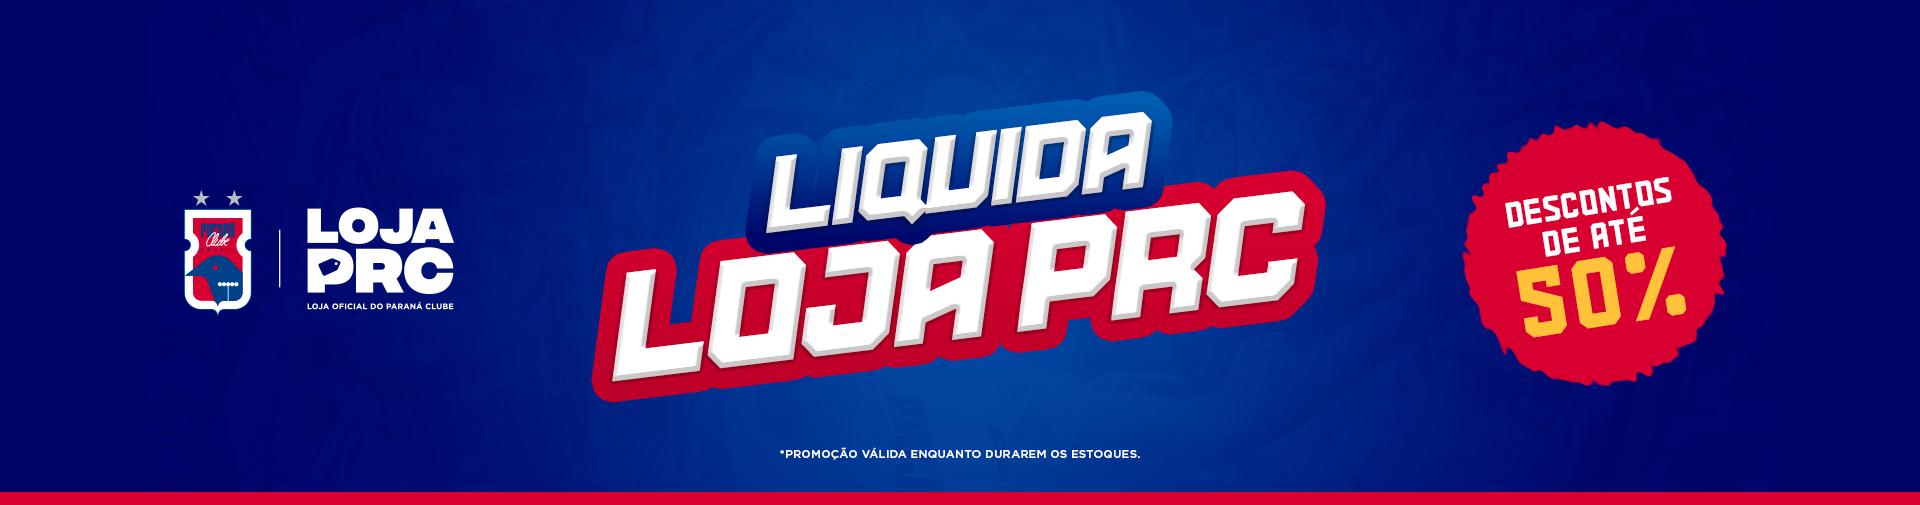 Liquida Loja PRC